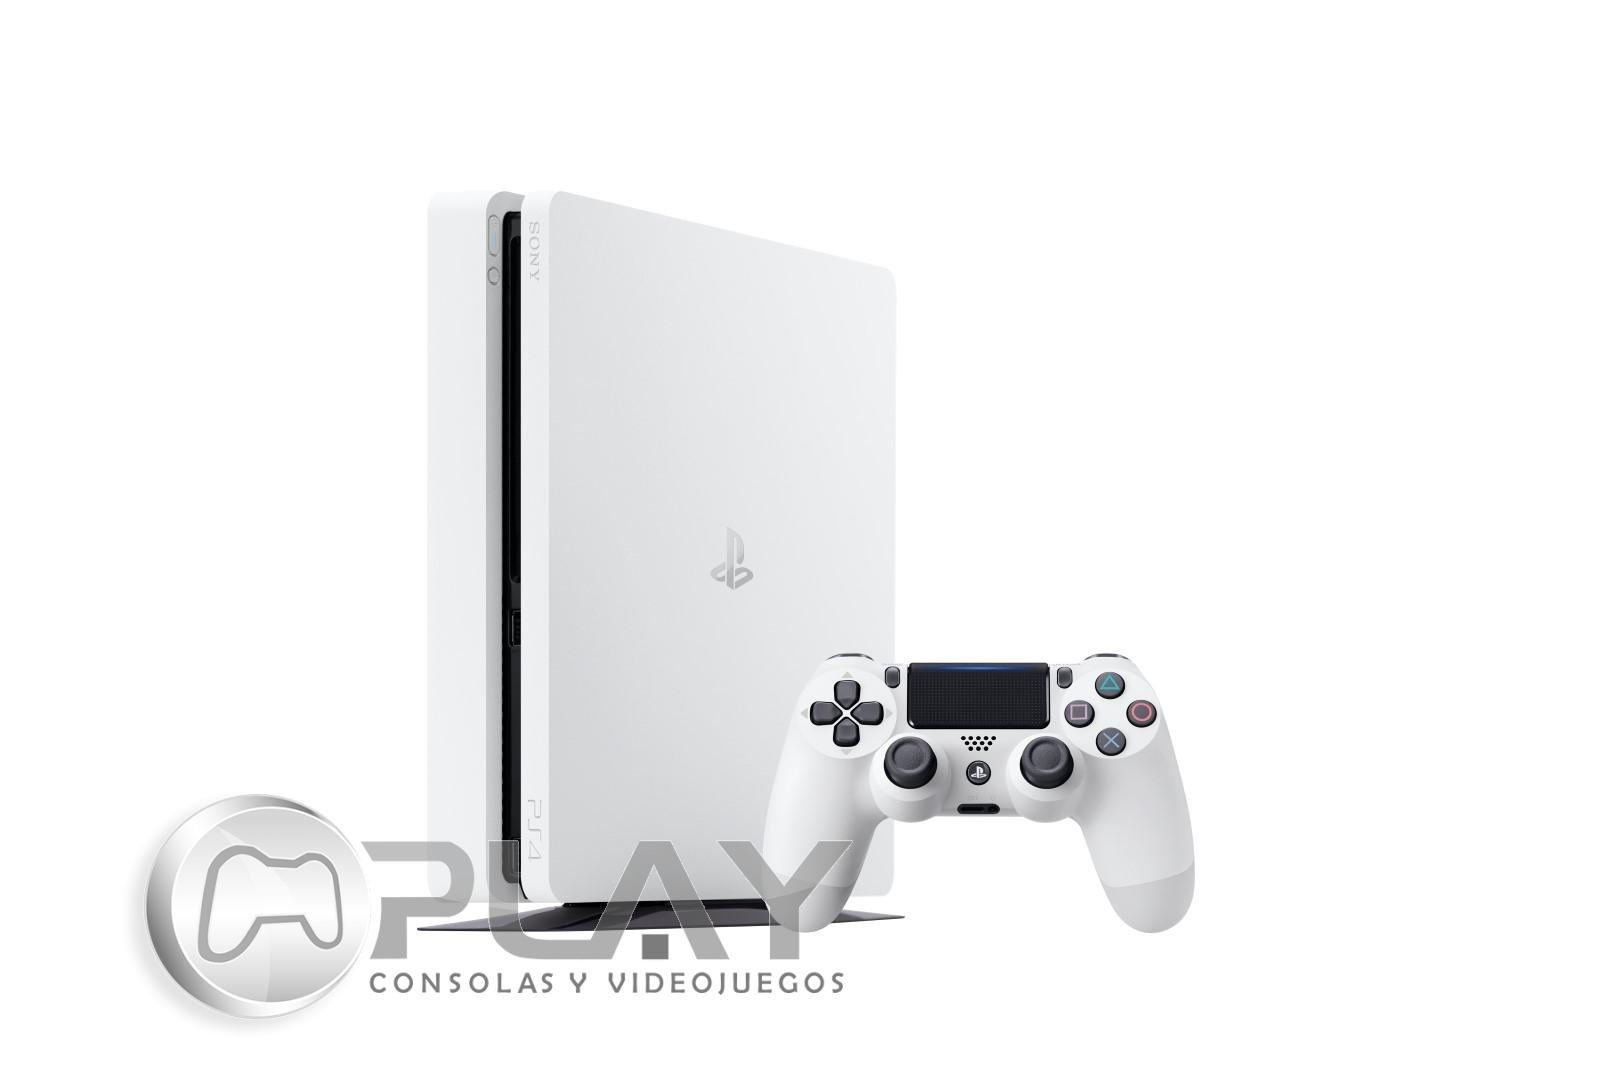 ps4 slim blanche console 500 go pack 2 jeux fifa 17. Black Bedroom Furniture Sets. Home Design Ideas